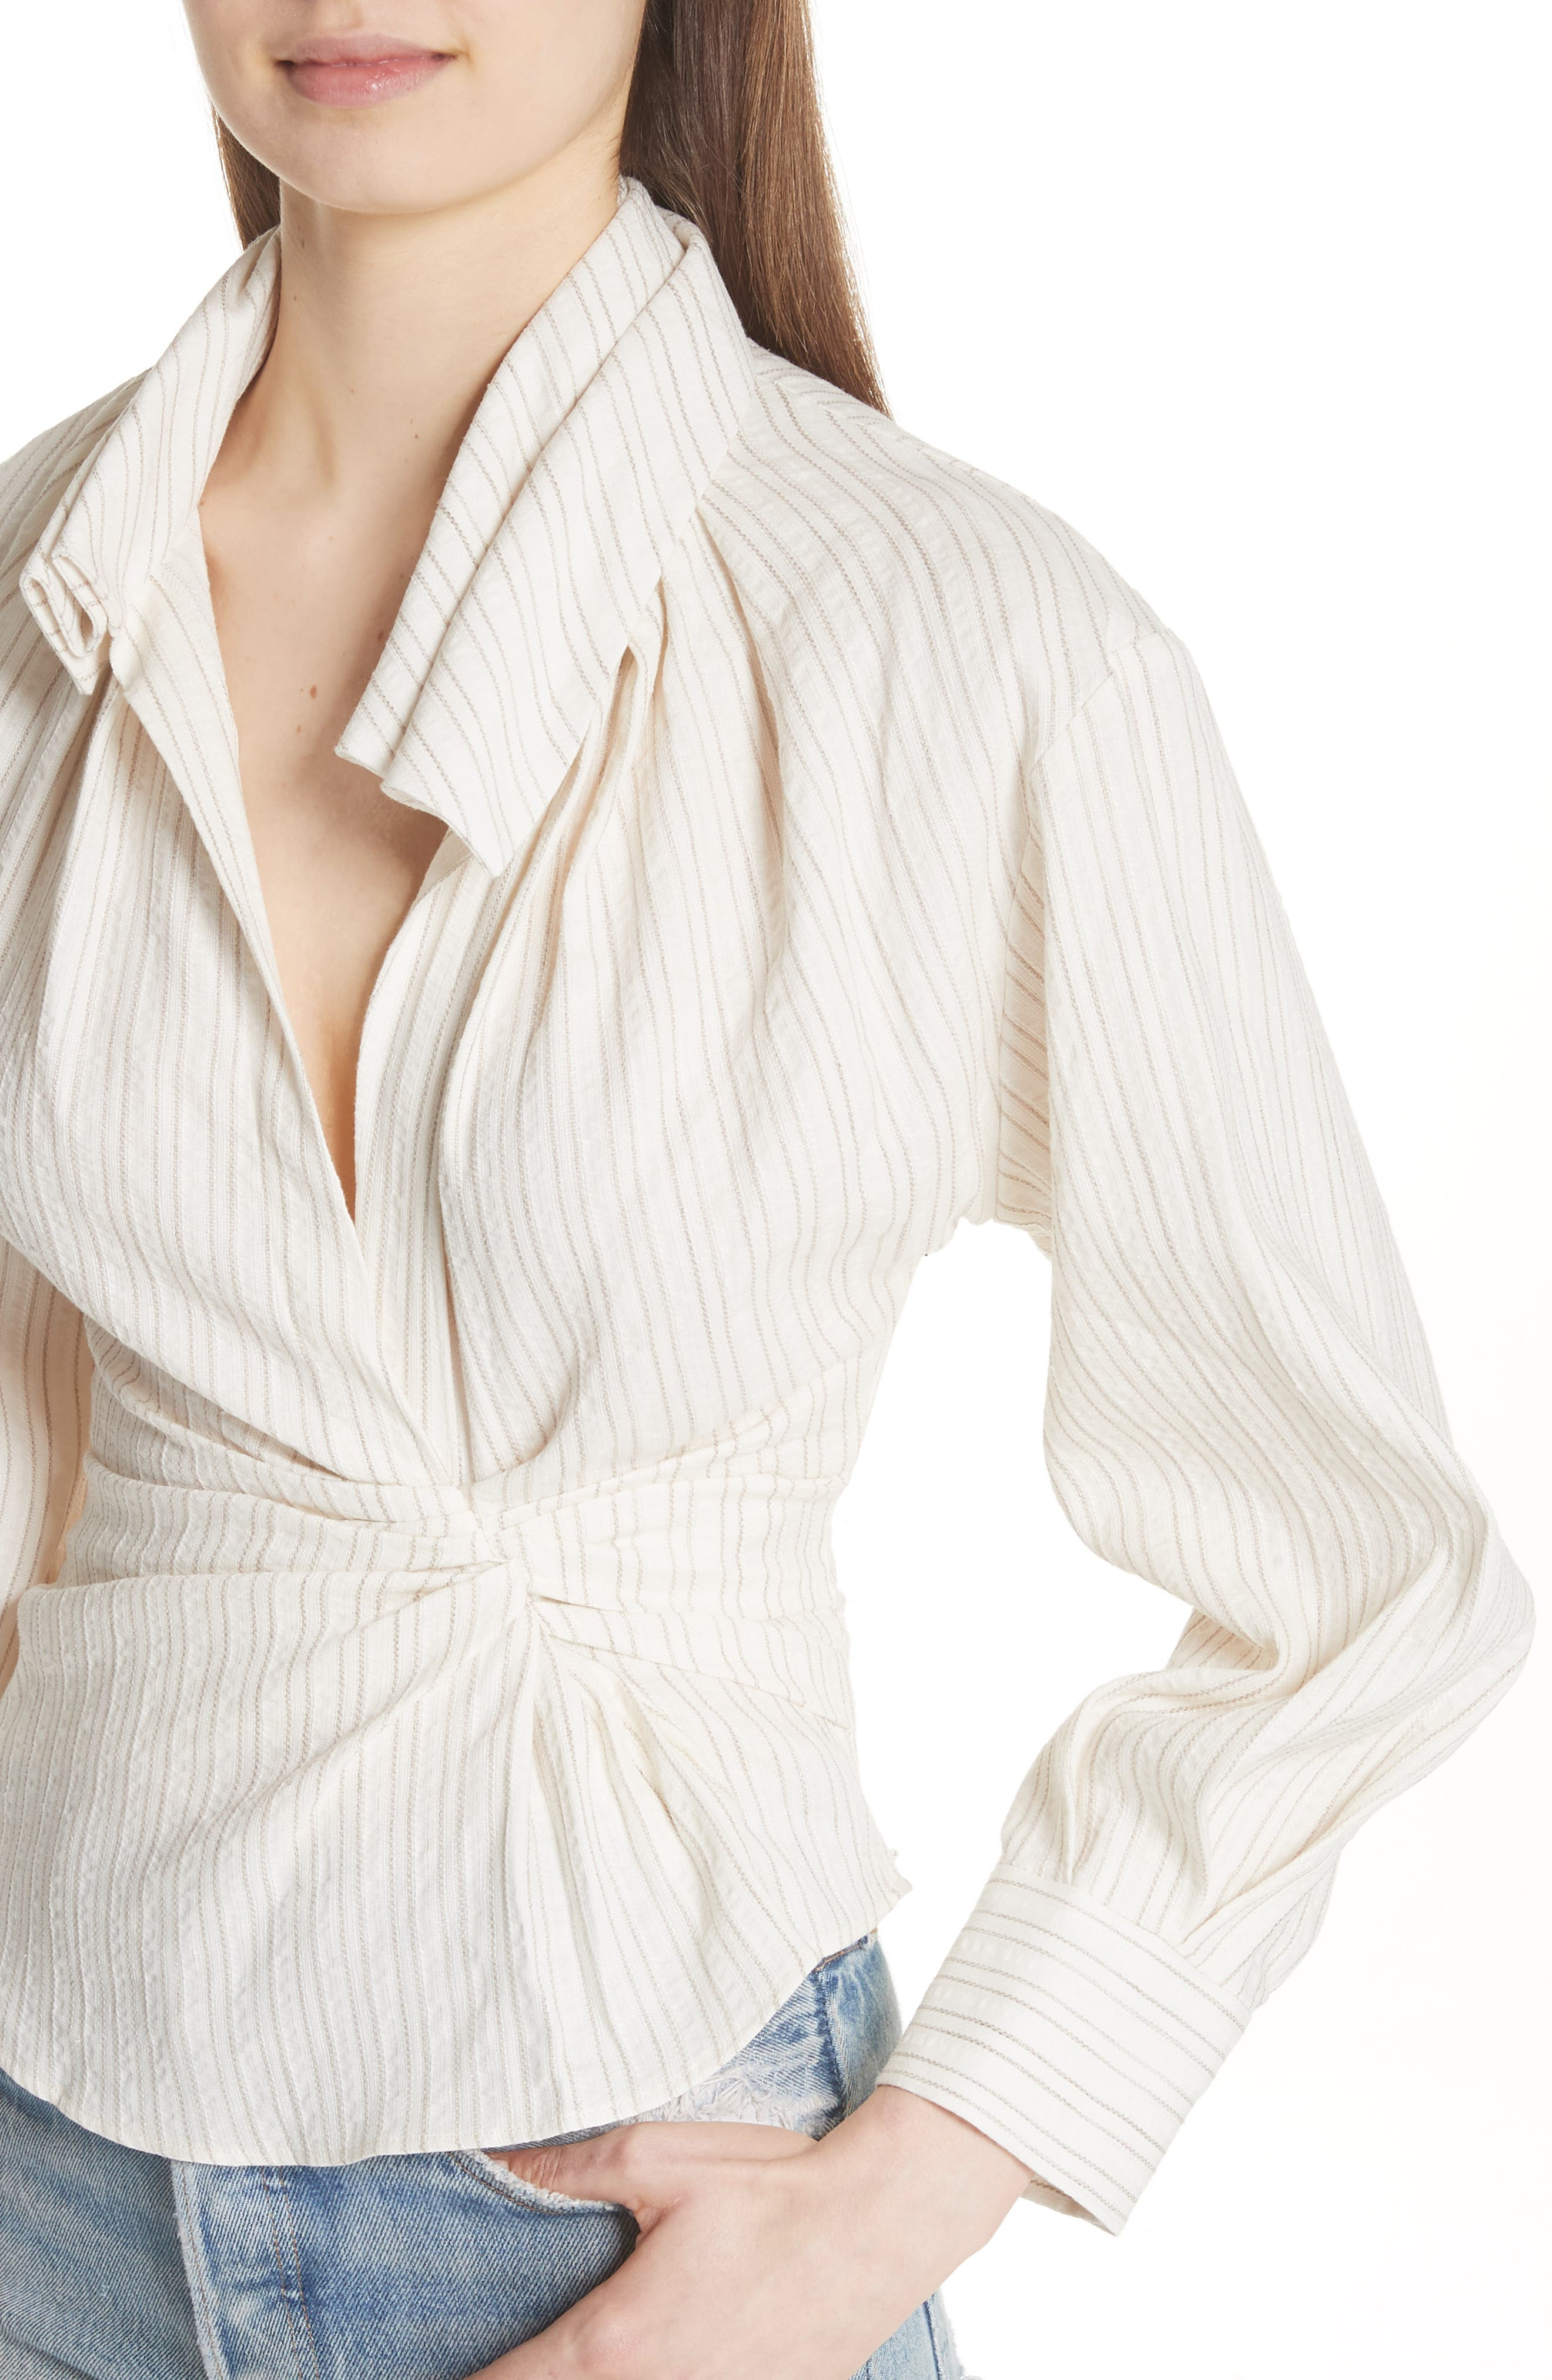 La Chemise Belem Shirt,                             Alternate thumbnail 4, color,                             Beige Striped